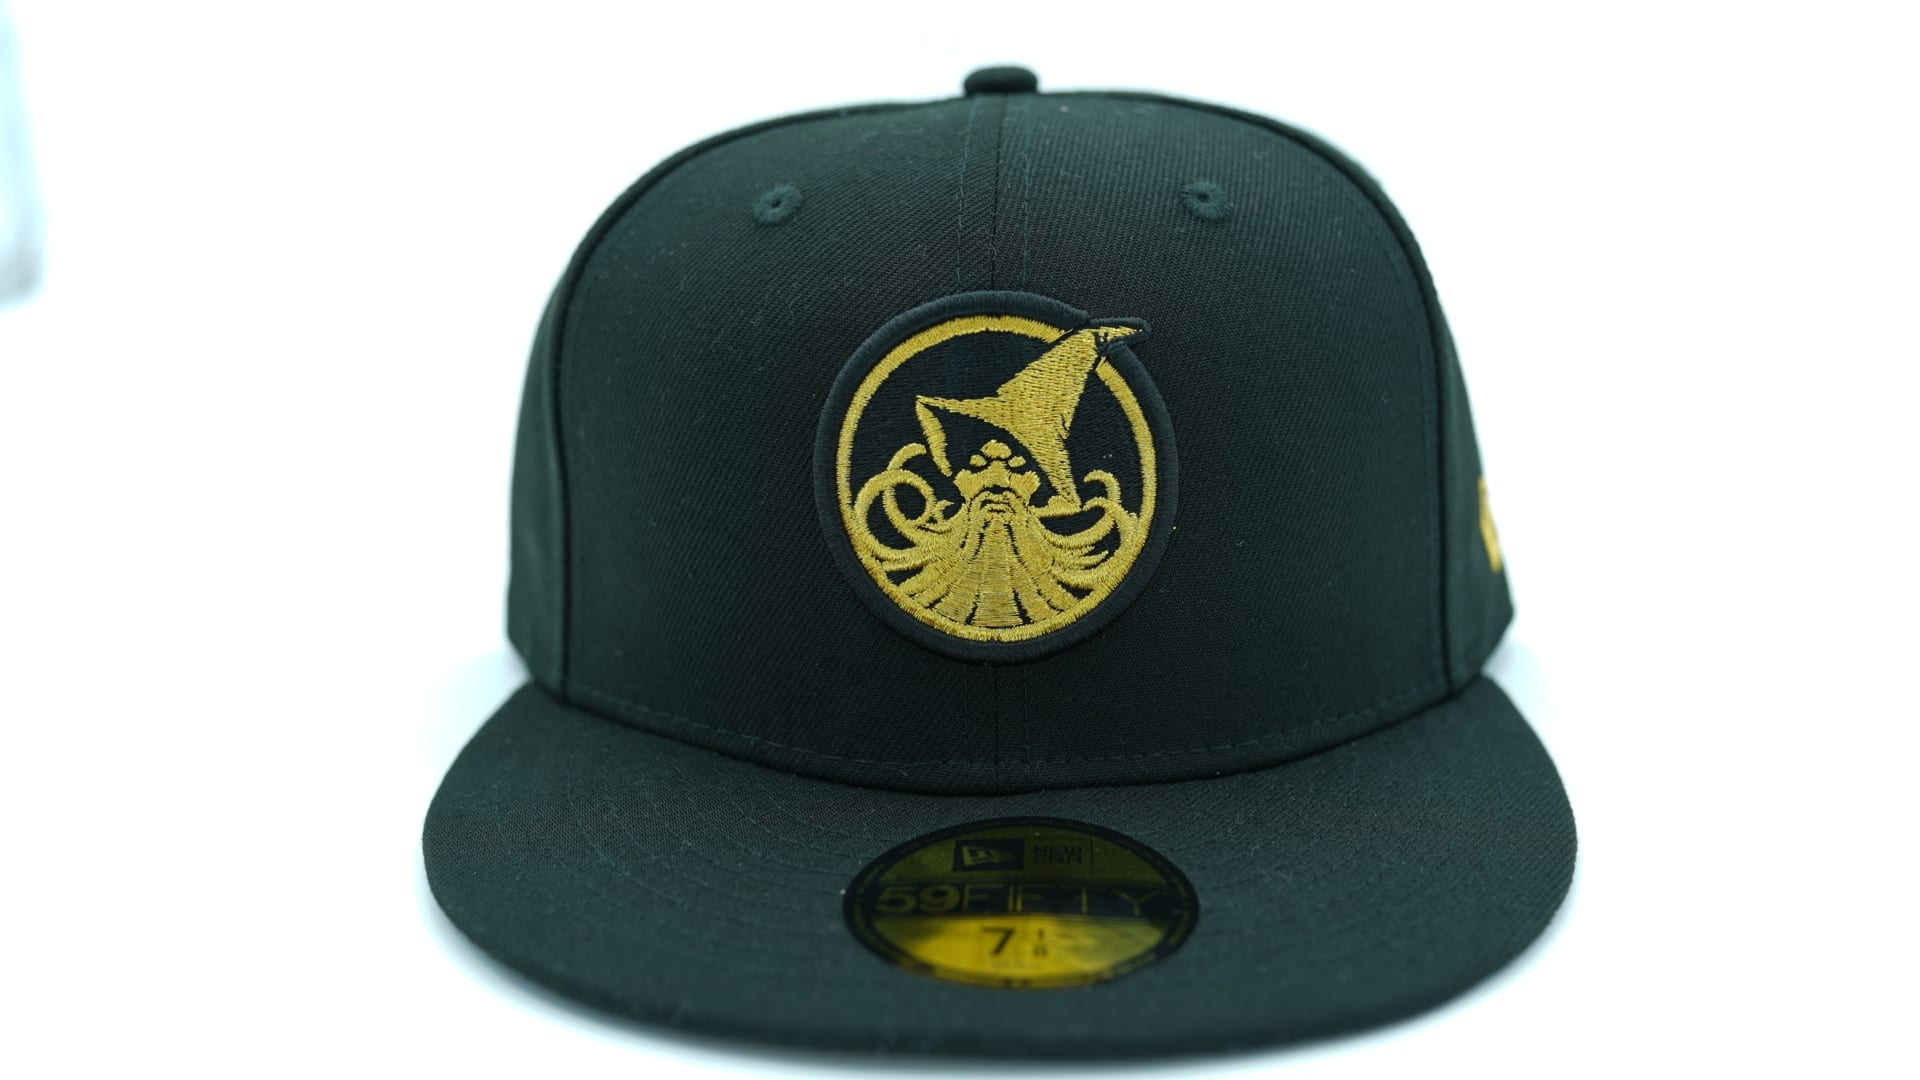 ab12c0c458d699 ... netherlands texas rangers wool standard heritage series 59fifty fitted  baseball cap new era mlb 1 1da20